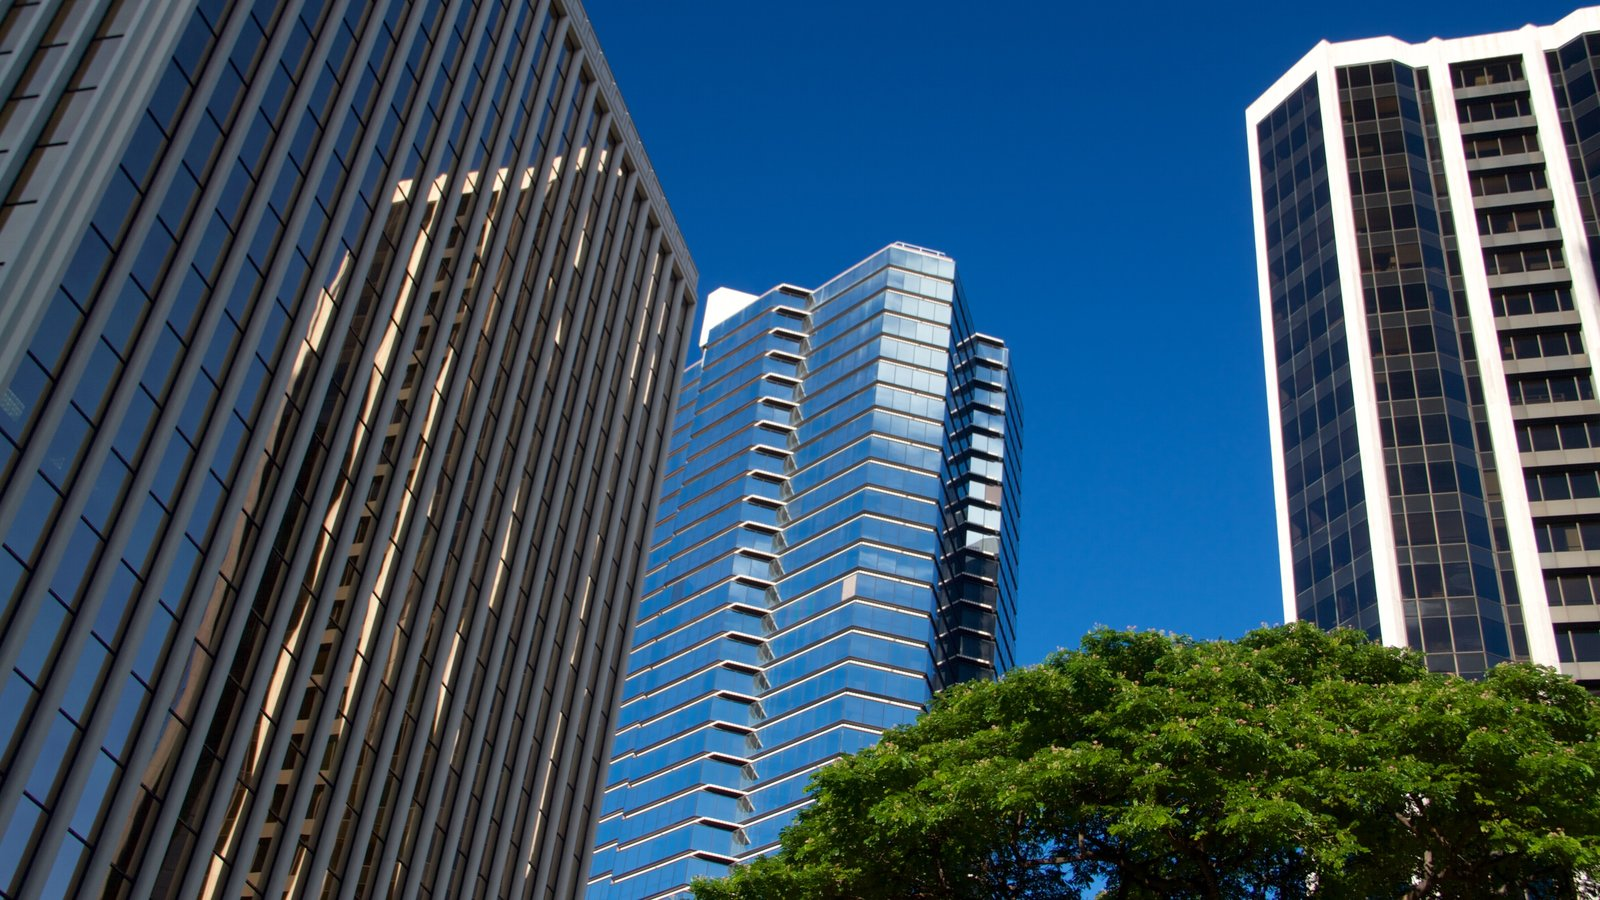 Oahu caracterizando arquitetura moderna